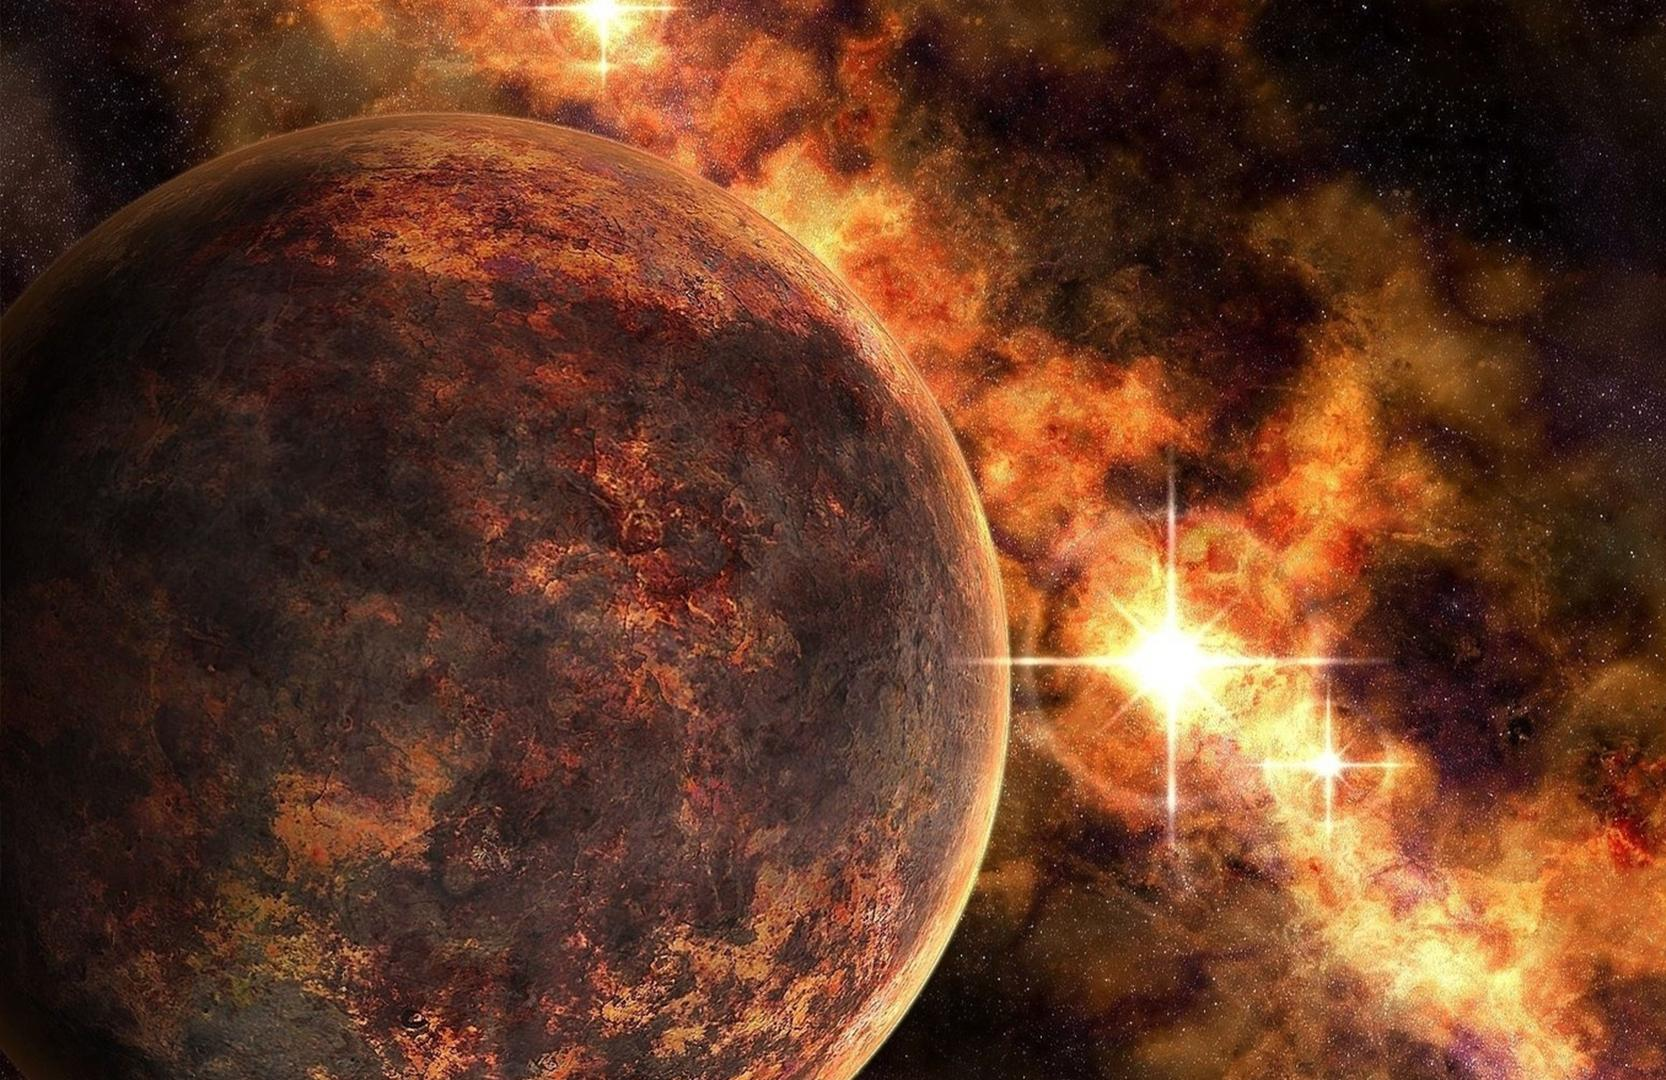 конец света, апокалипсис, нибиру, армагедон, фото, нло, космос, соцсети